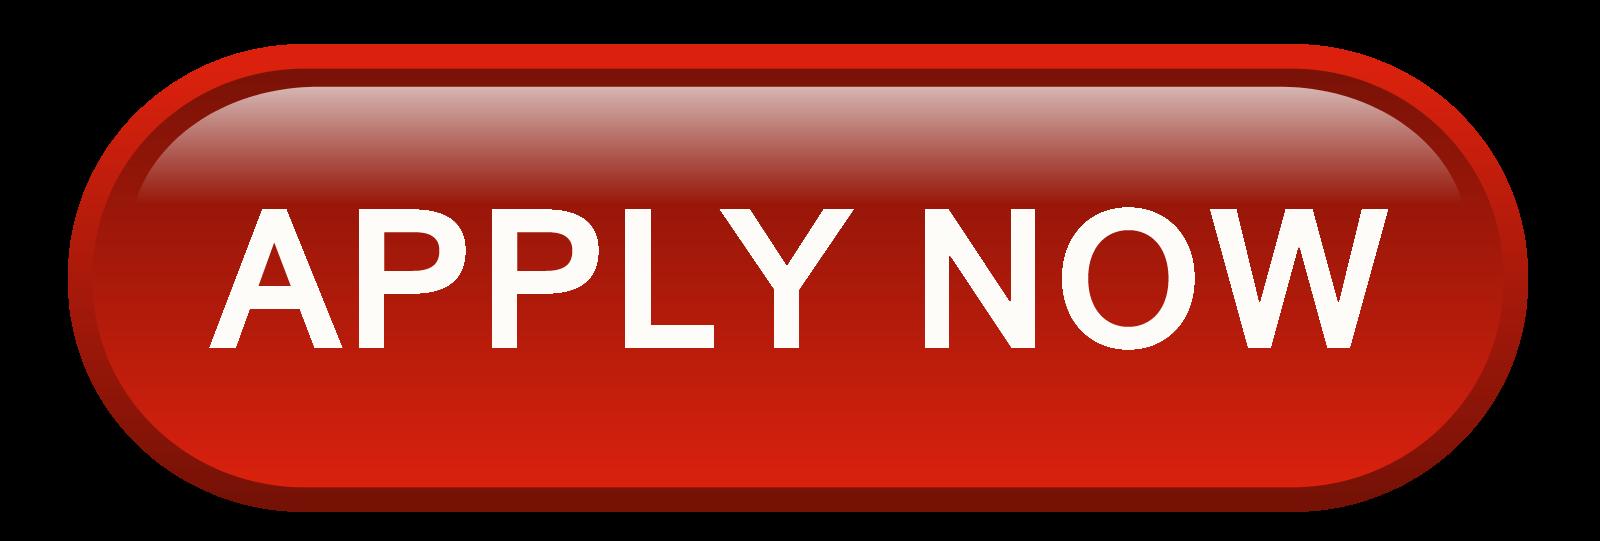 Job Search Sites In Usa - www.rockcup.tk